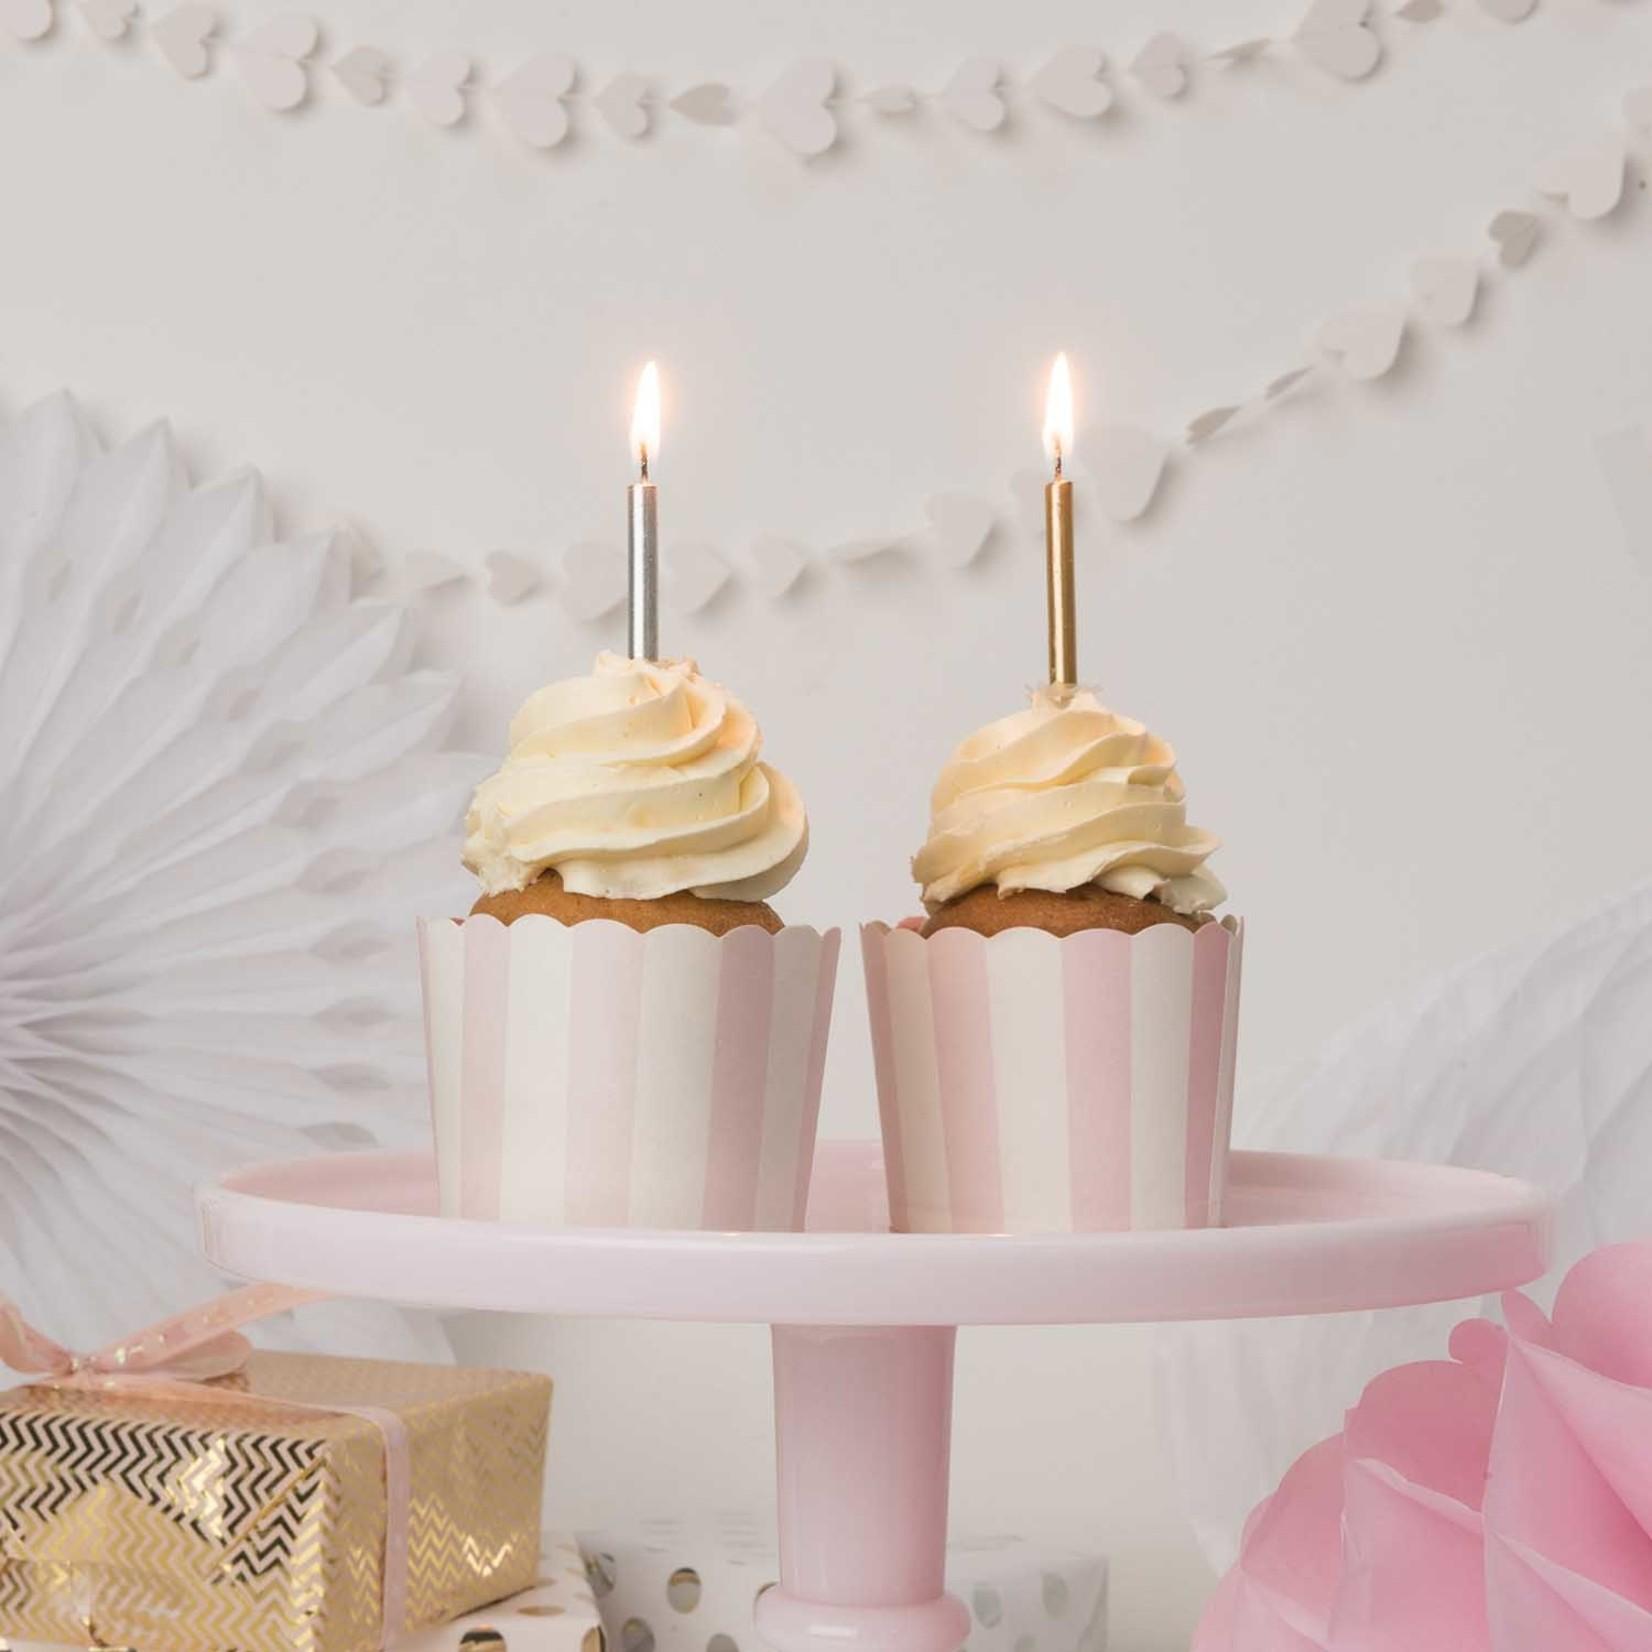 Rico Design 48teiliges Kerzenset in gold & silber